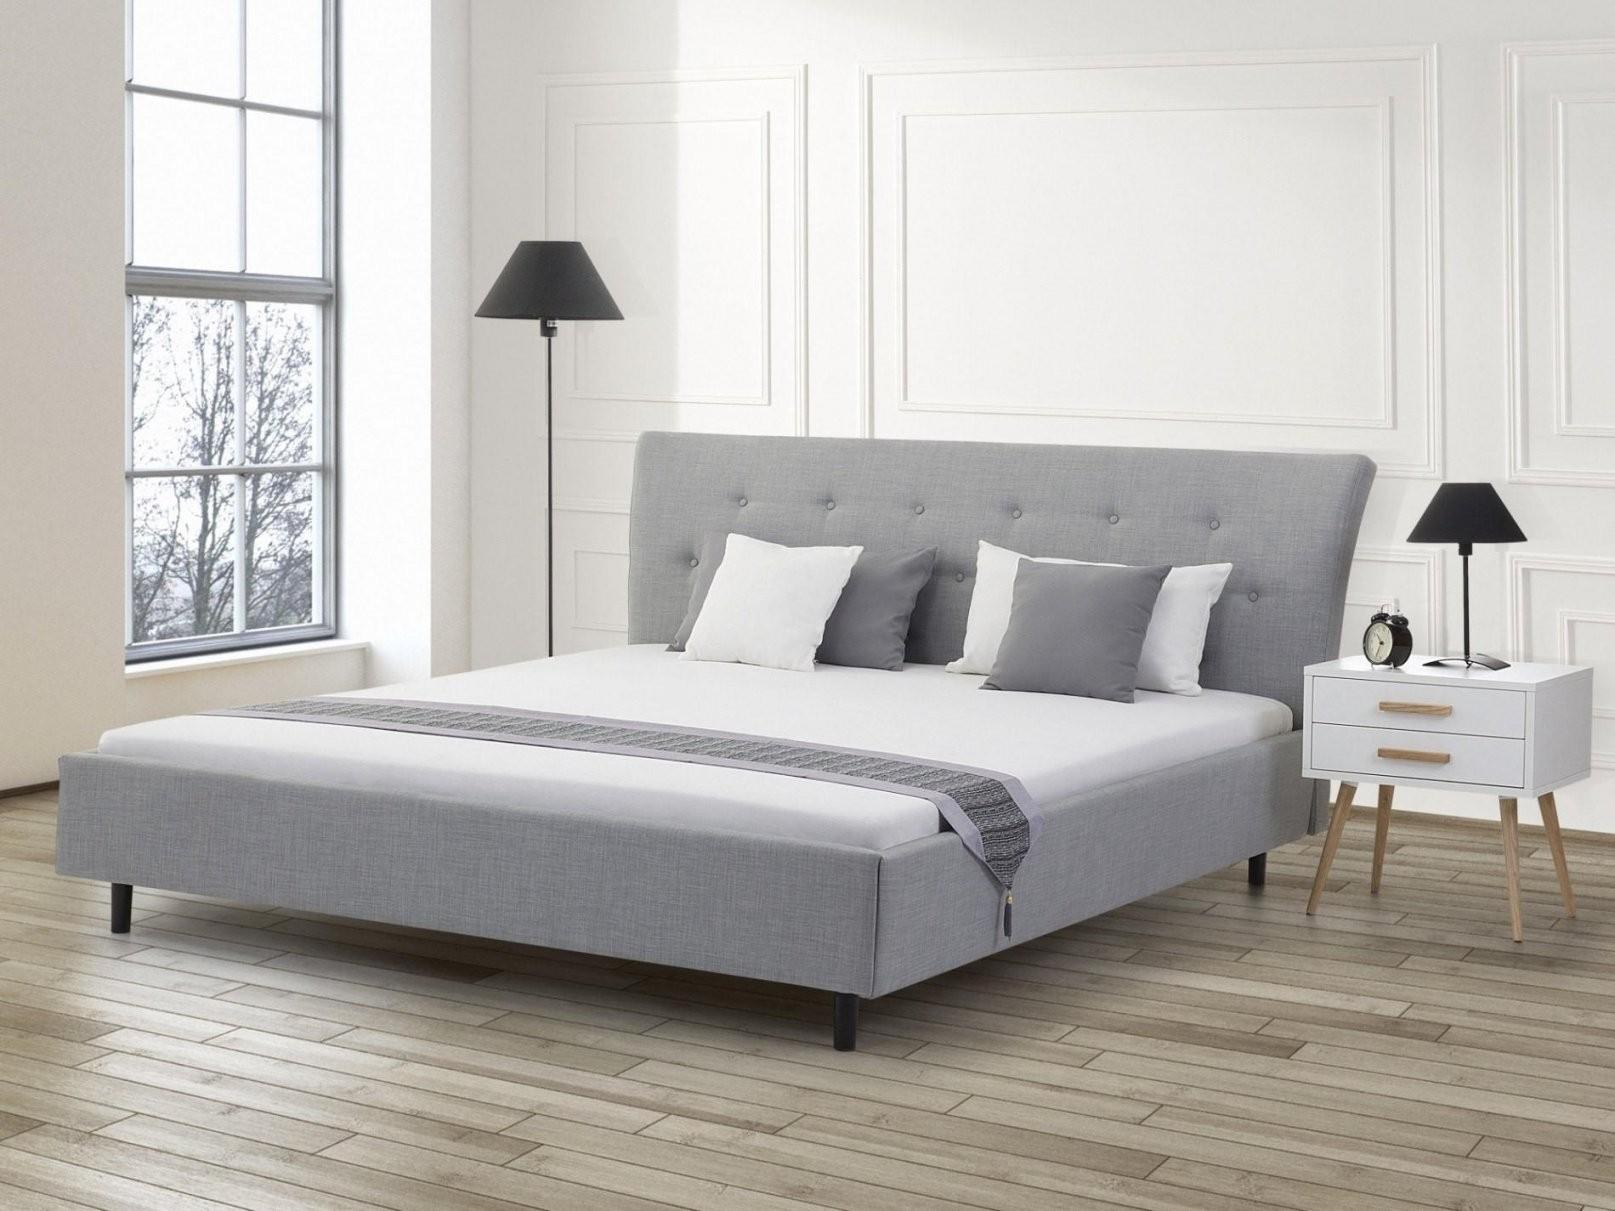 Phänomenal Boxspring Matratze Für Normales Bett  Huambodigital von Boxspring Matratze Für Normales Bett Bild